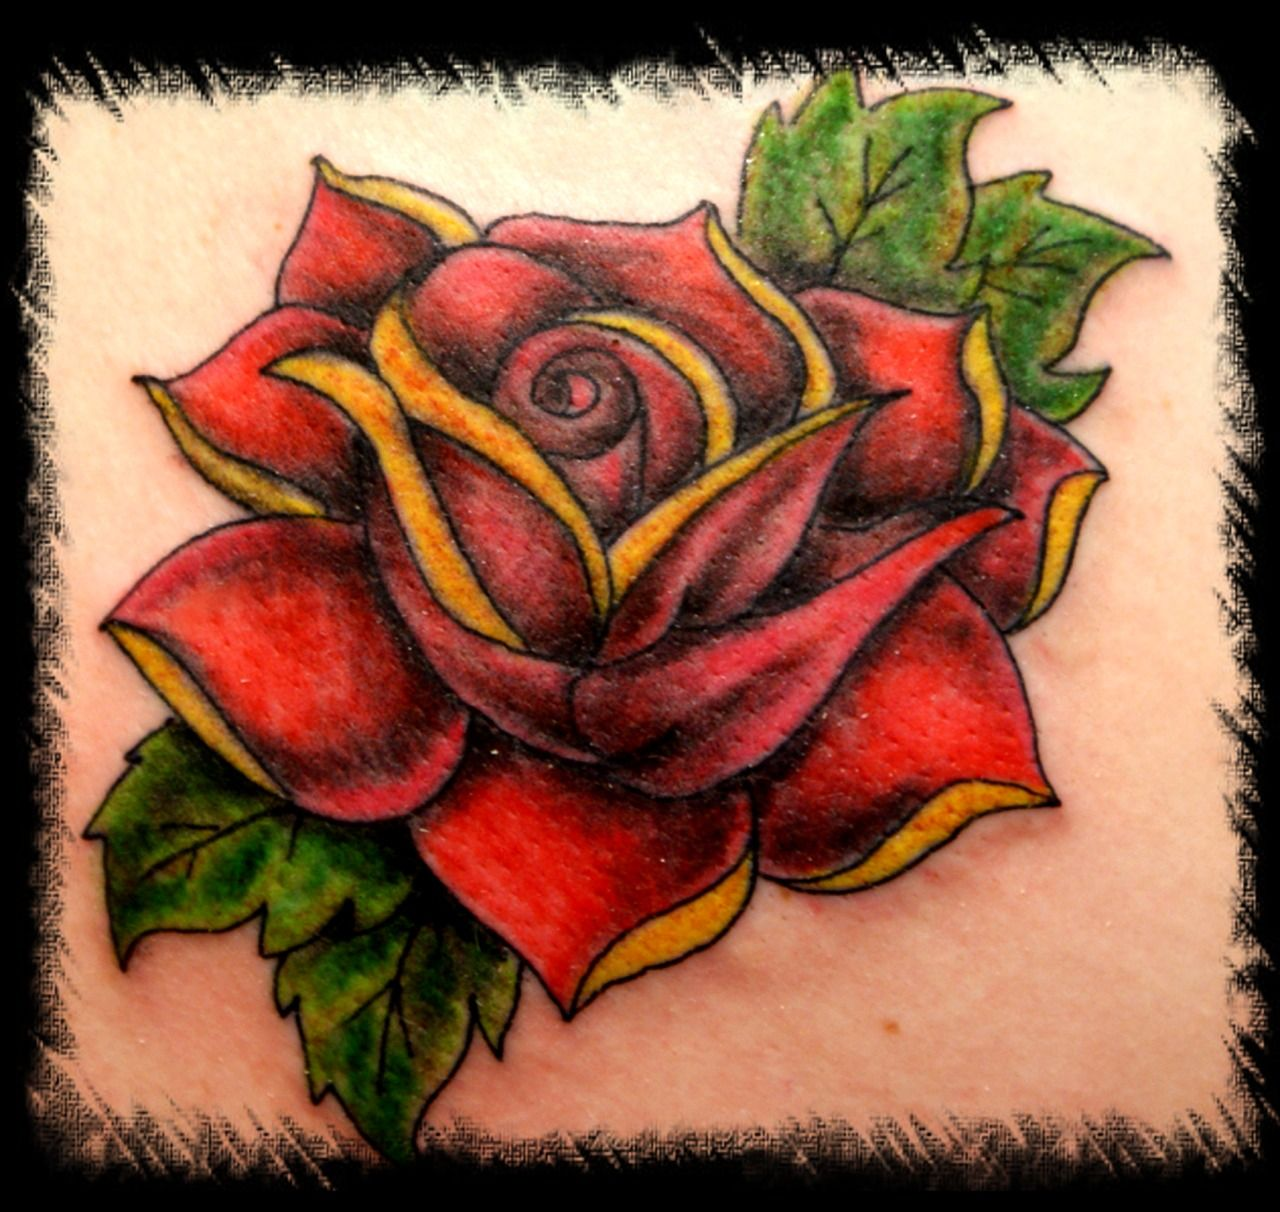 tattoo rose vine designs on leg - Google Search | Tats ...